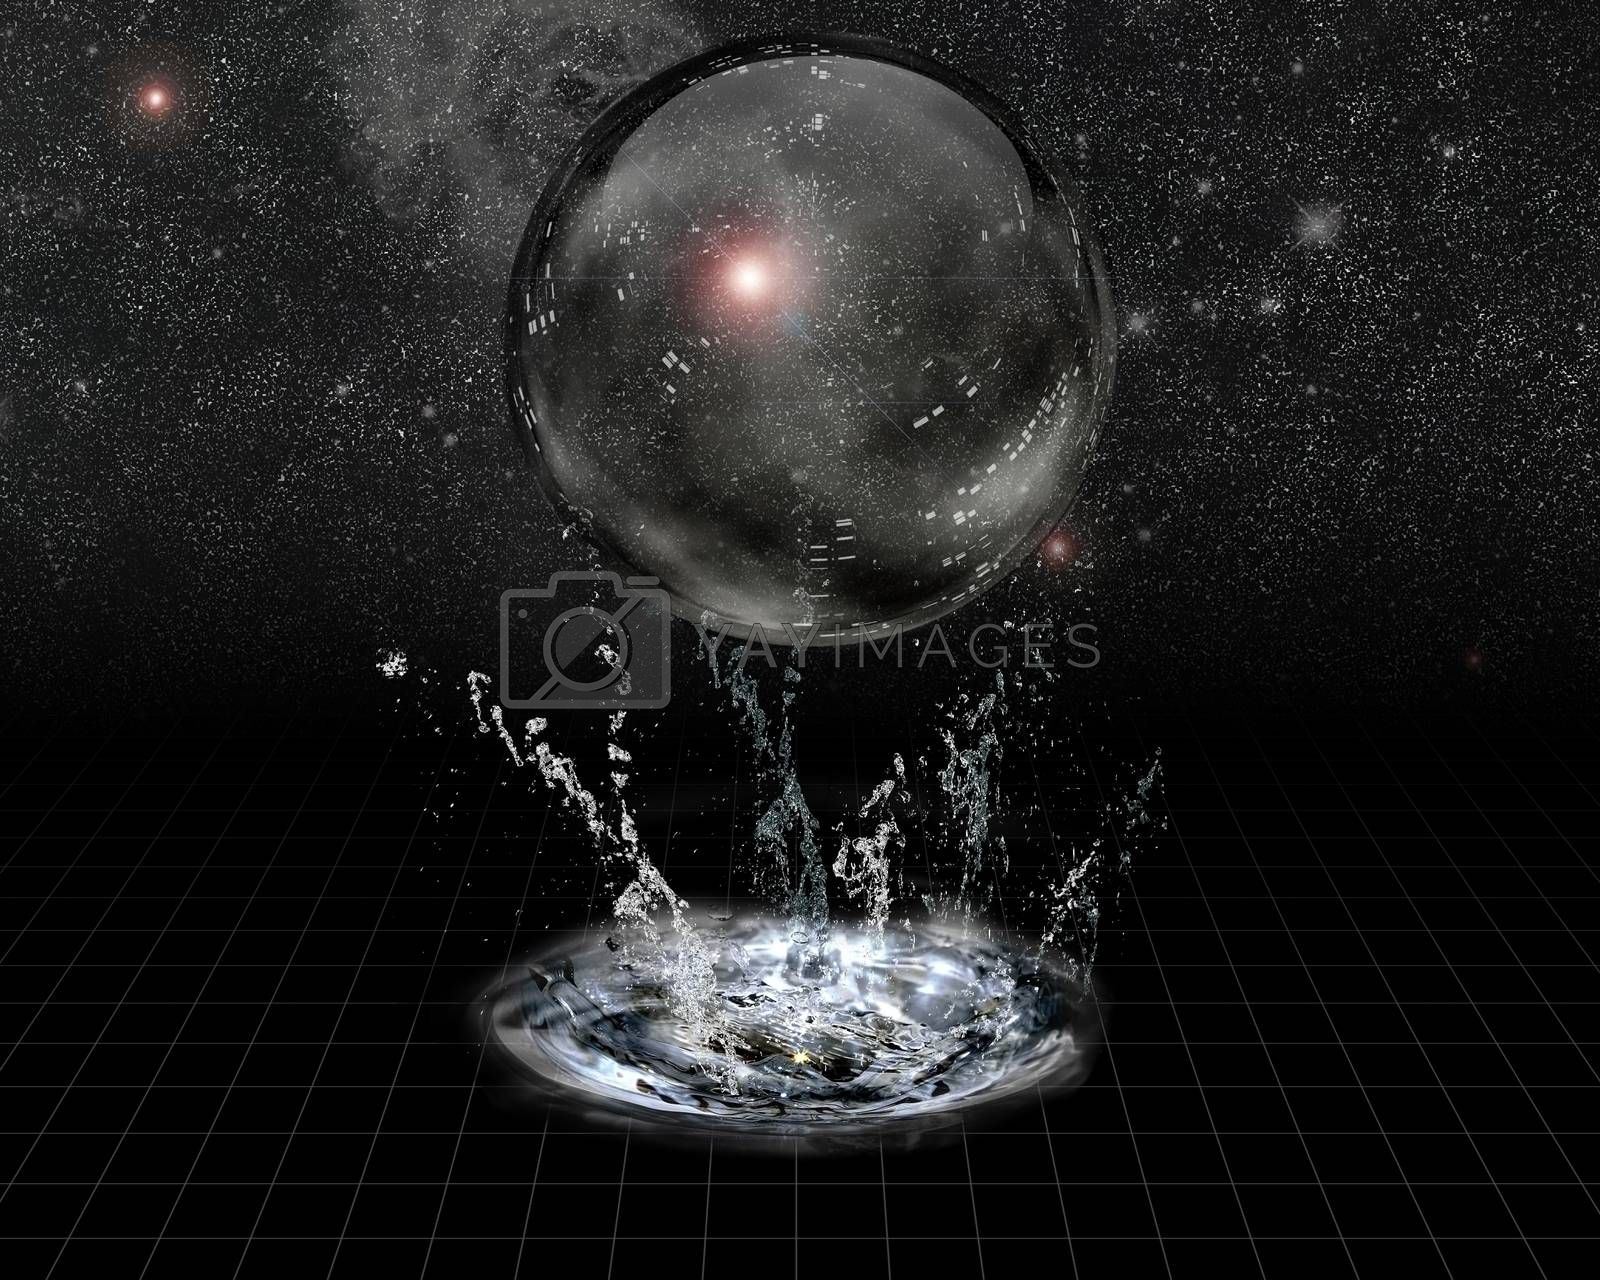 Crystal Sphere and splash before stars